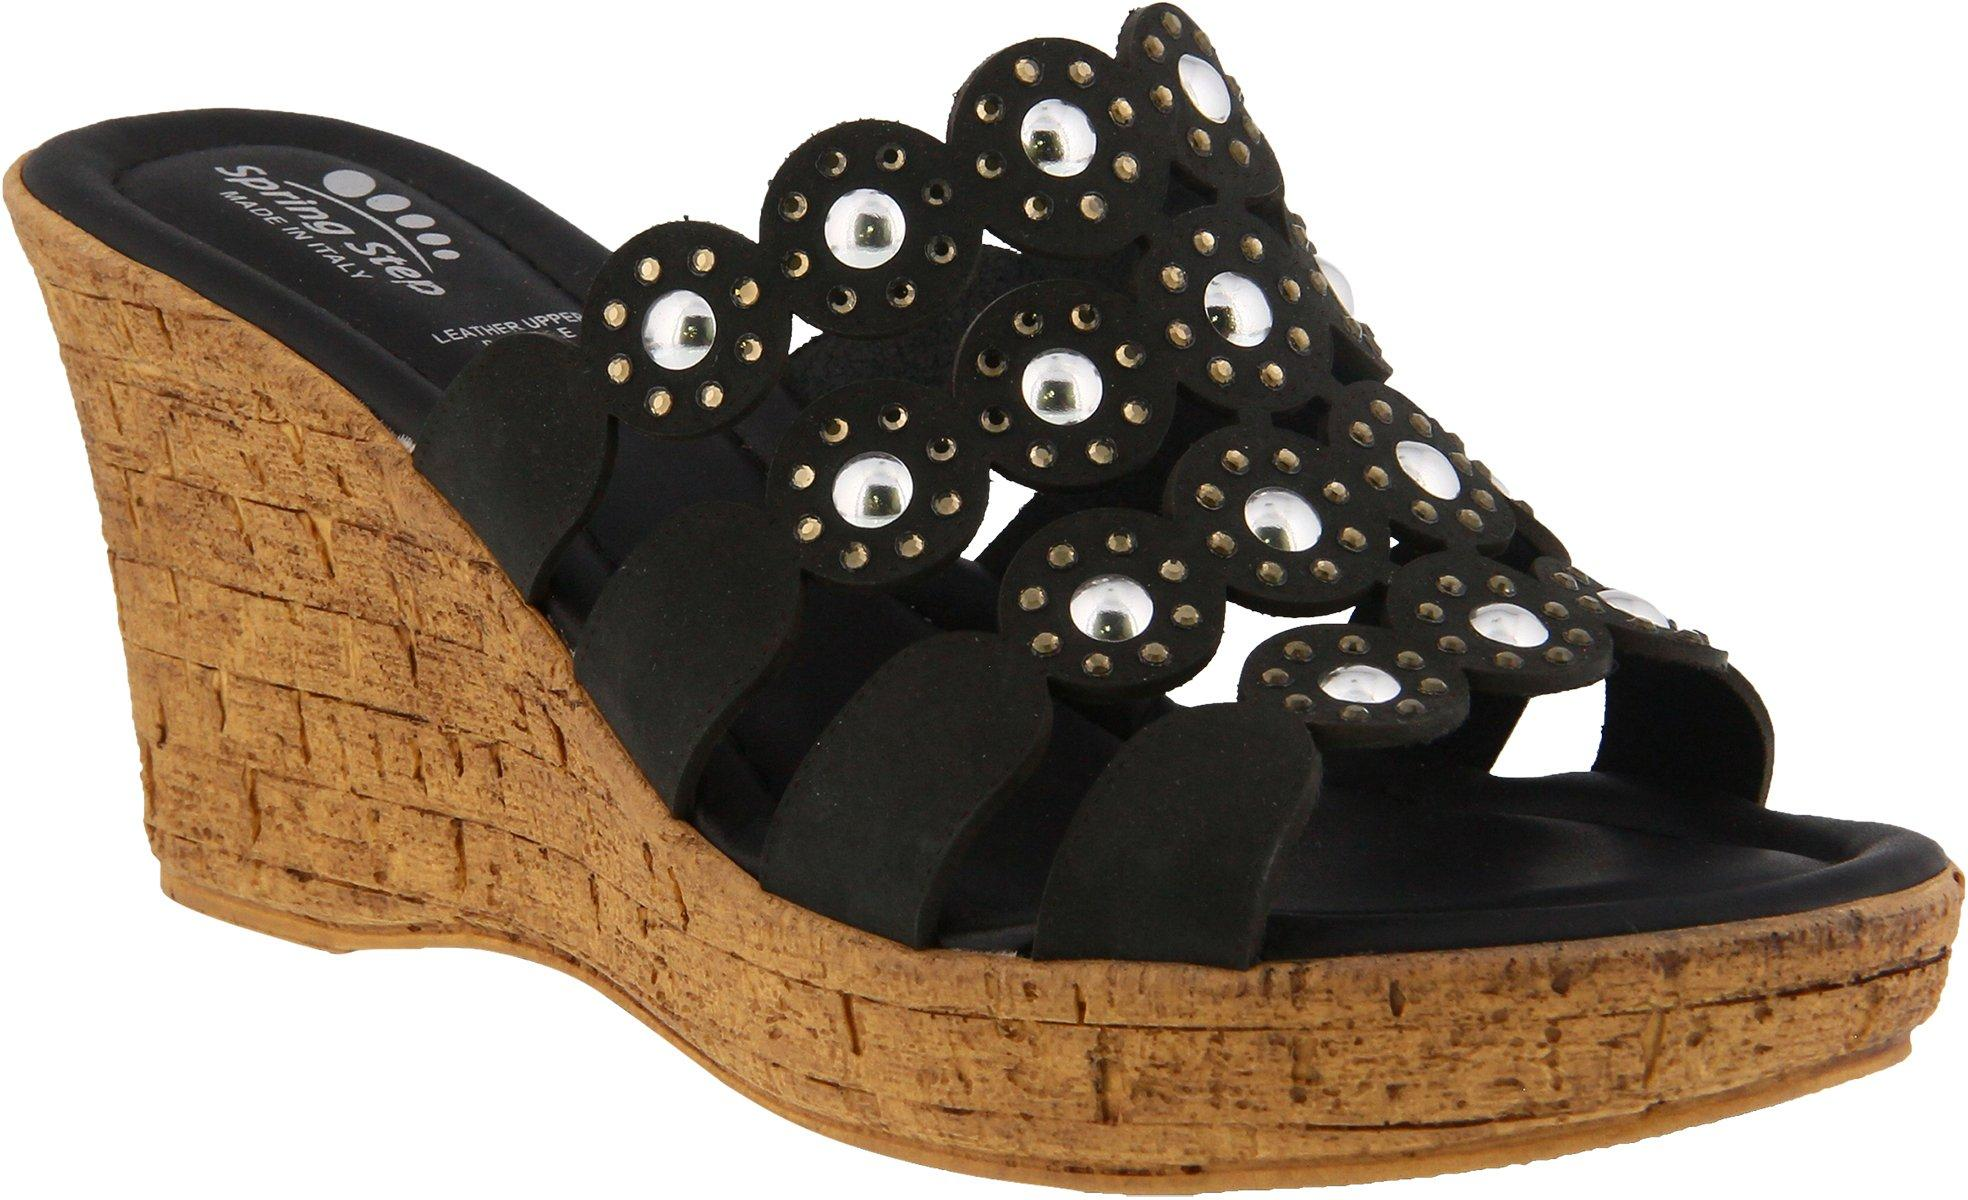 Womens Spring Step Chaya Slide Sandal Color Cobalt Blue 39 Womens Star-Shaped Laser-Cut Leather Peep-Toe Sandal